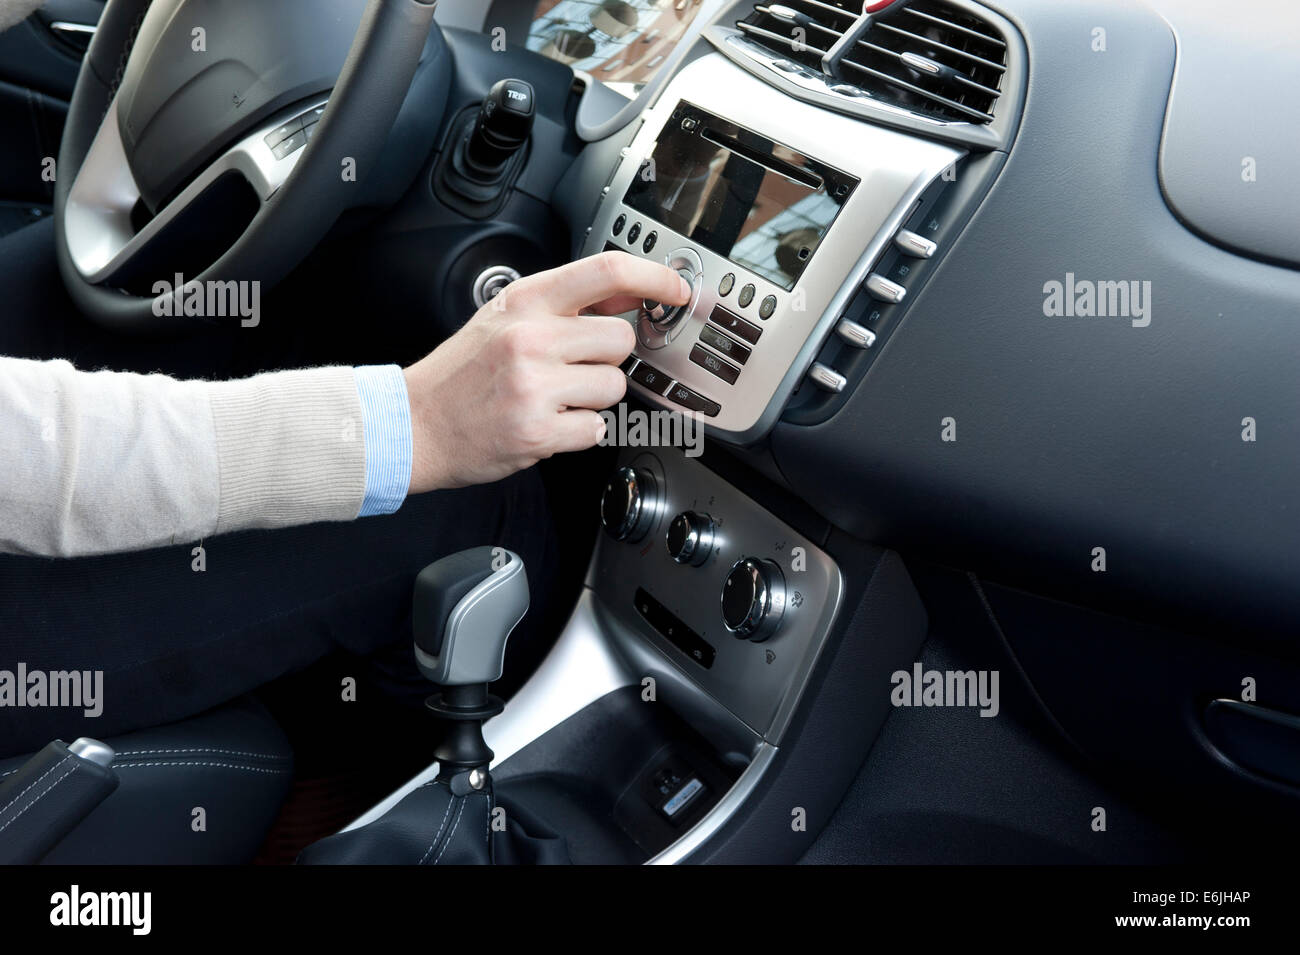 interior trim of a modern new car - Stock Image